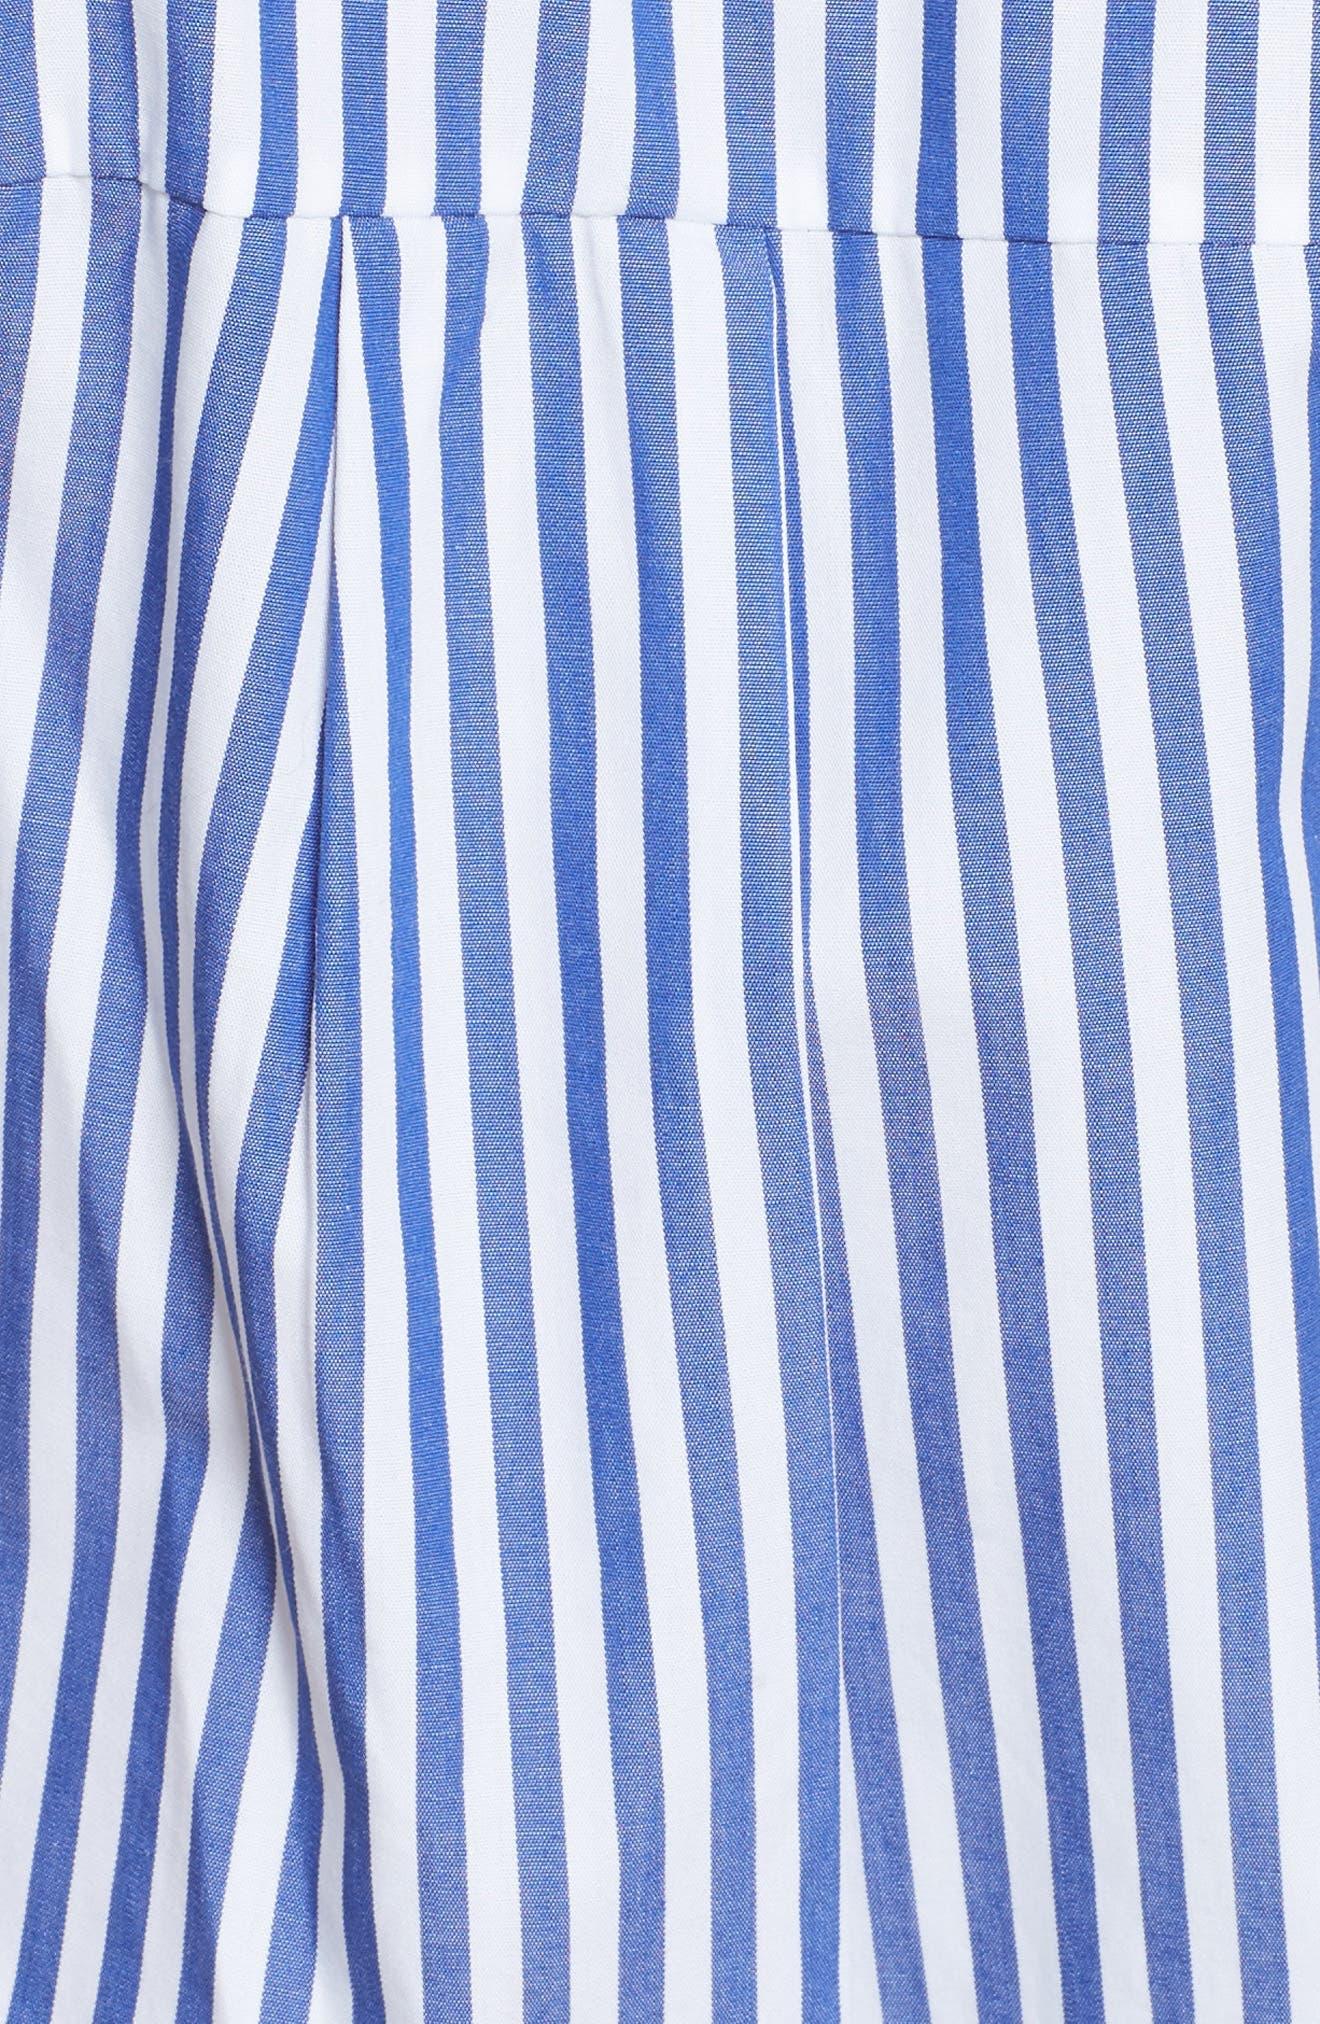 Ruched Stripe Shirtdress,                             Alternate thumbnail 5, color,                             BLUE/WHITE STRIPE